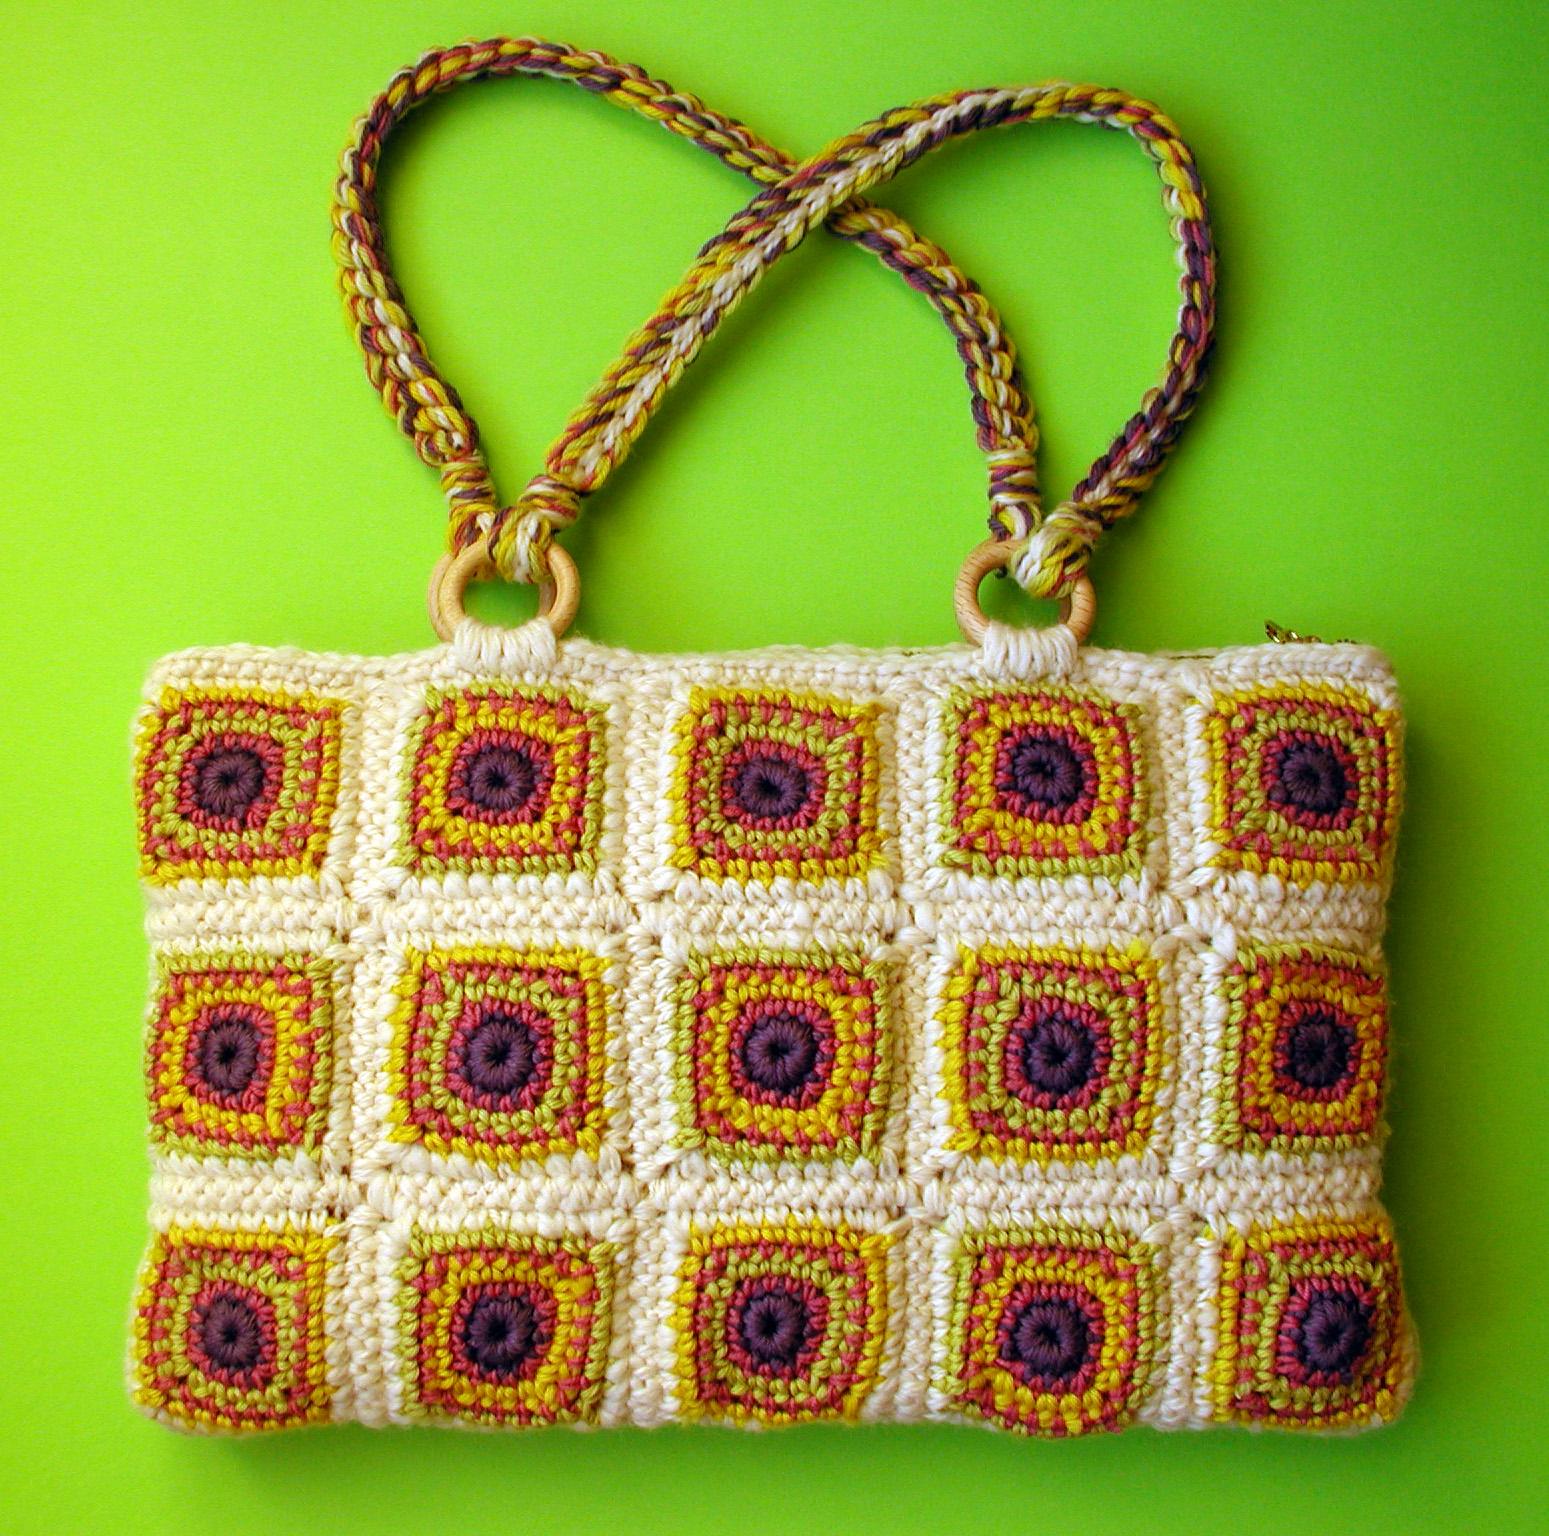 Cheyenne Special Tote Bag - Cheyenne borsa tote Speciale